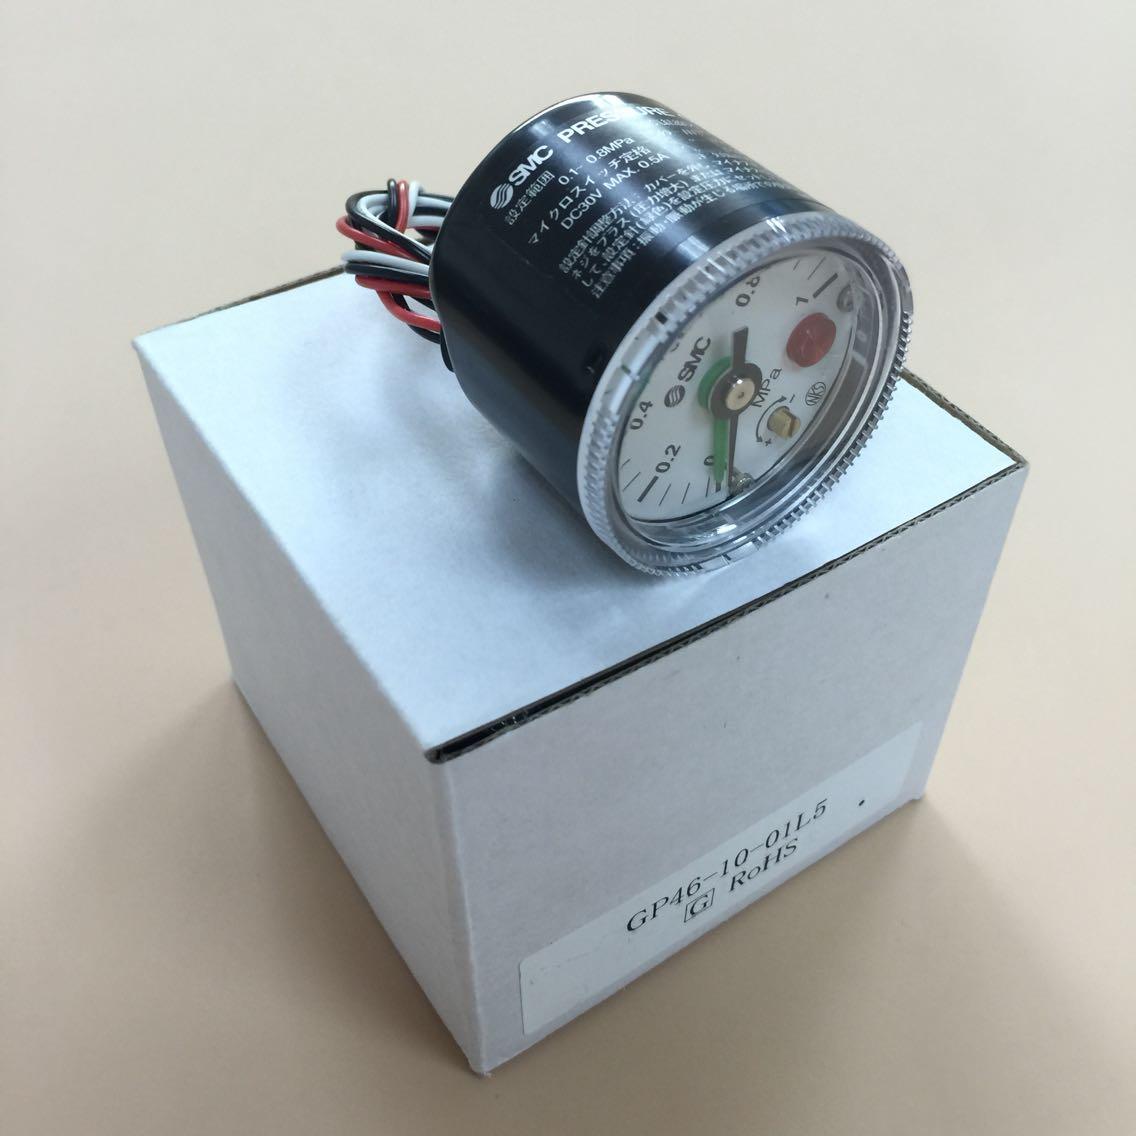 Original SMC Pressure Gauge GP46-10-01L5 GP46-10-01L2 GP46-10-02L5 GP46-10-02L2 2 5mpa pressure gauge yb150a zt